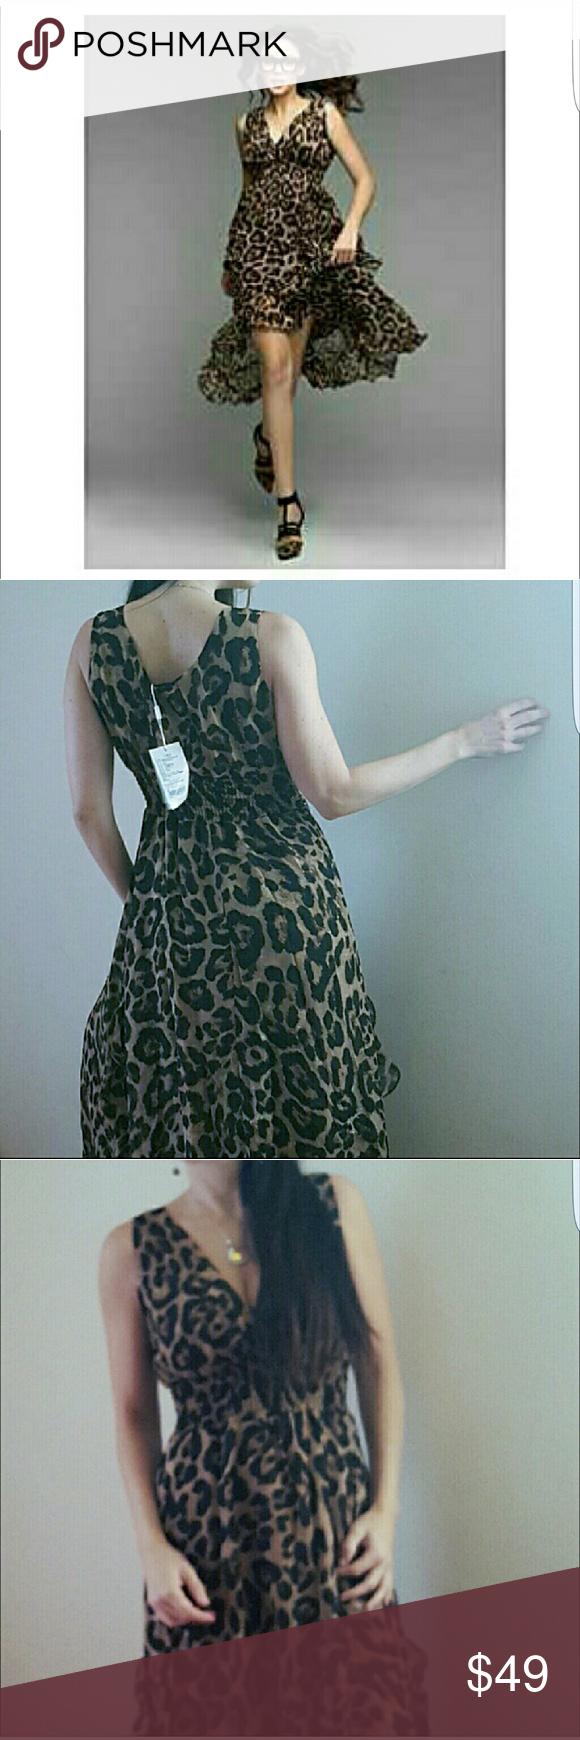 Maxi dress Women's Sexy Leopard Print Deep-V Neck Sleeveless Asymmetrical Maxi Dress boutique  Dresses Maxi